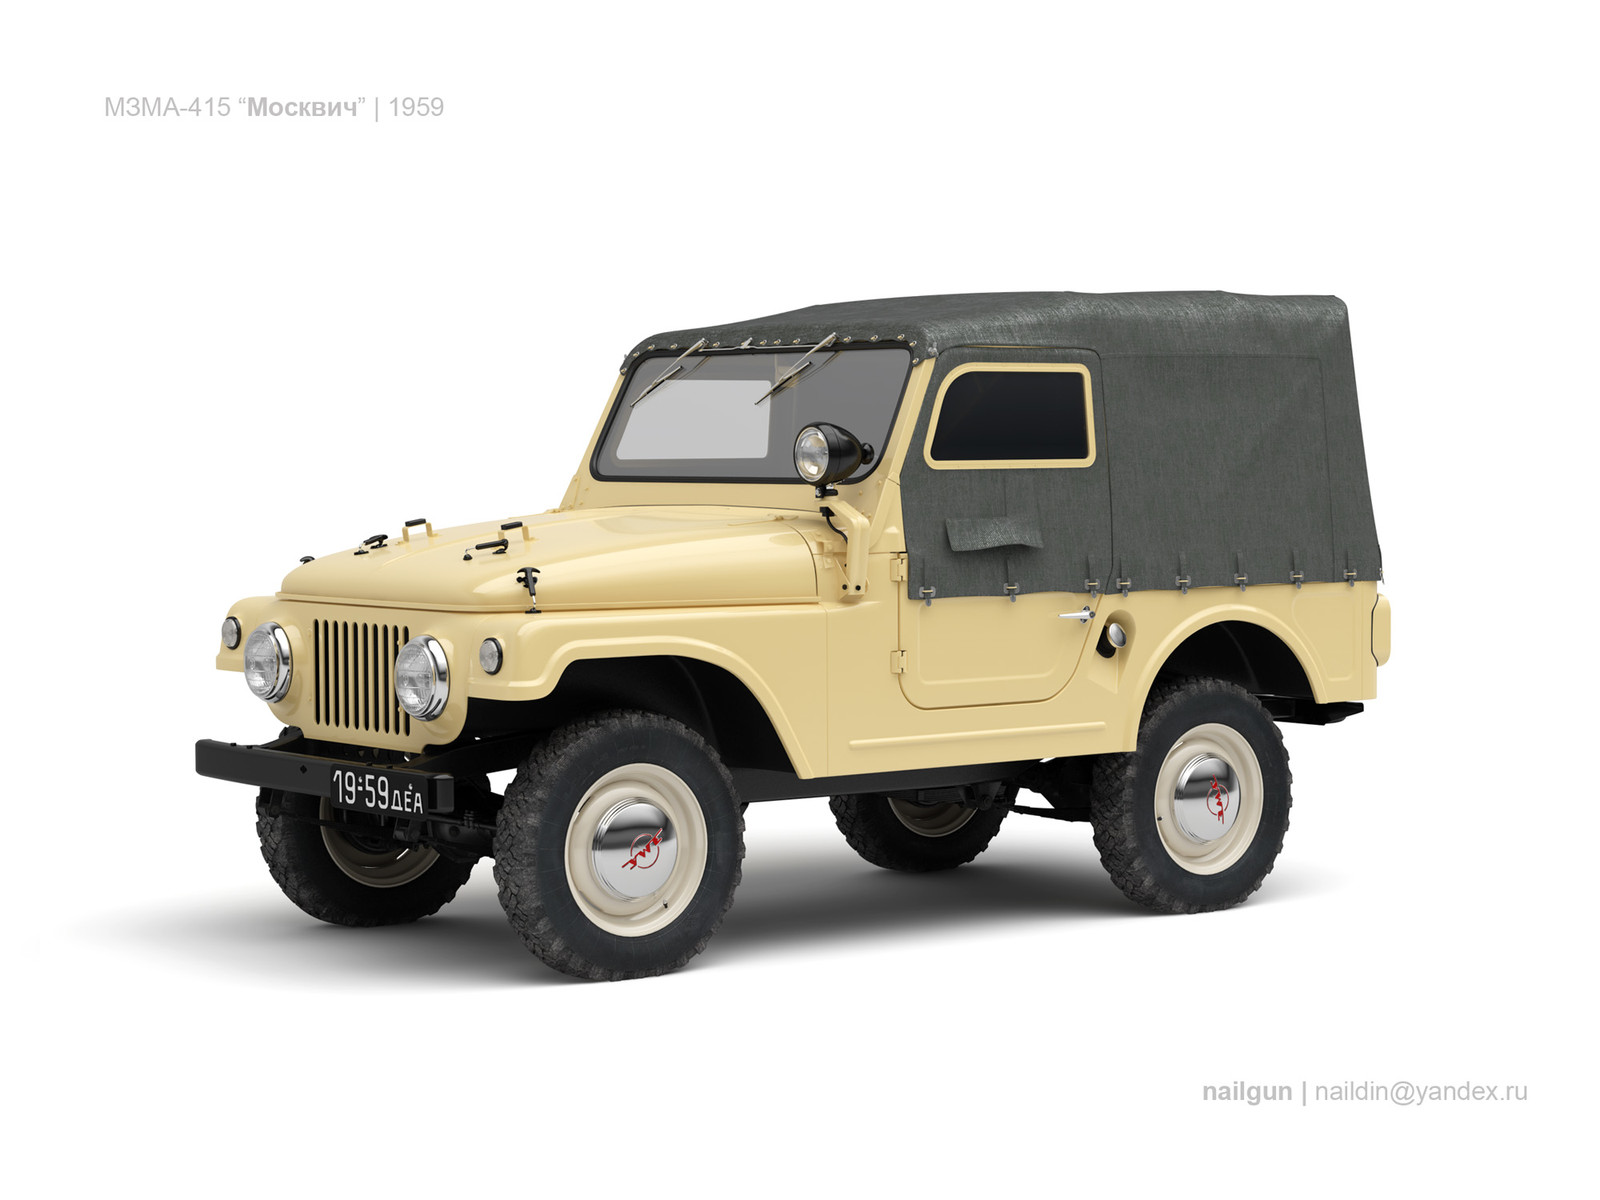 Moskvich-415